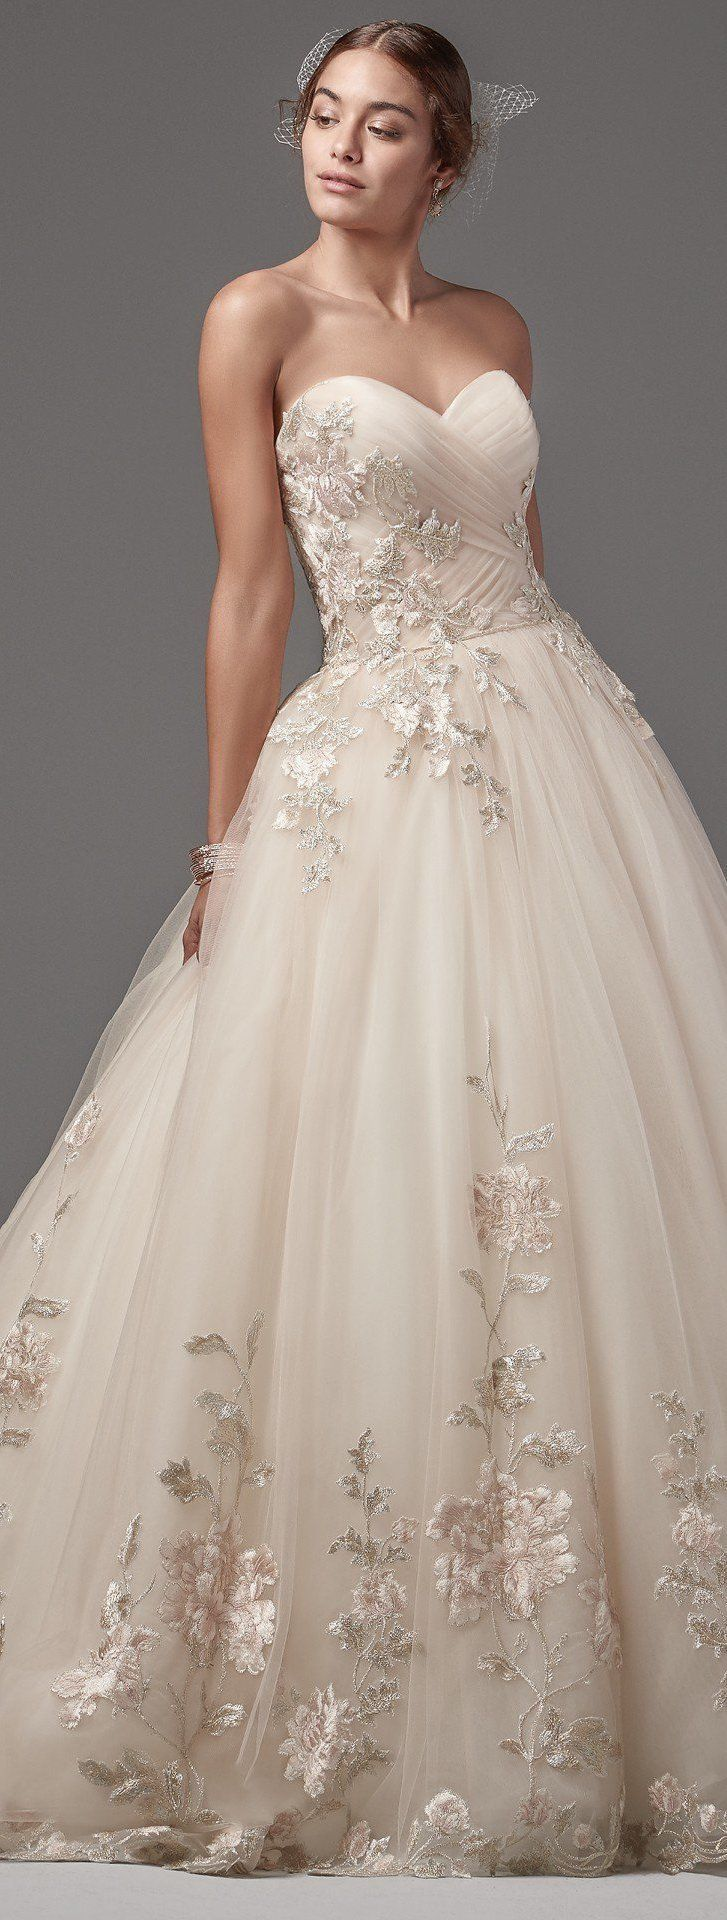 Wedding dress my wedding guides bridal pinterest